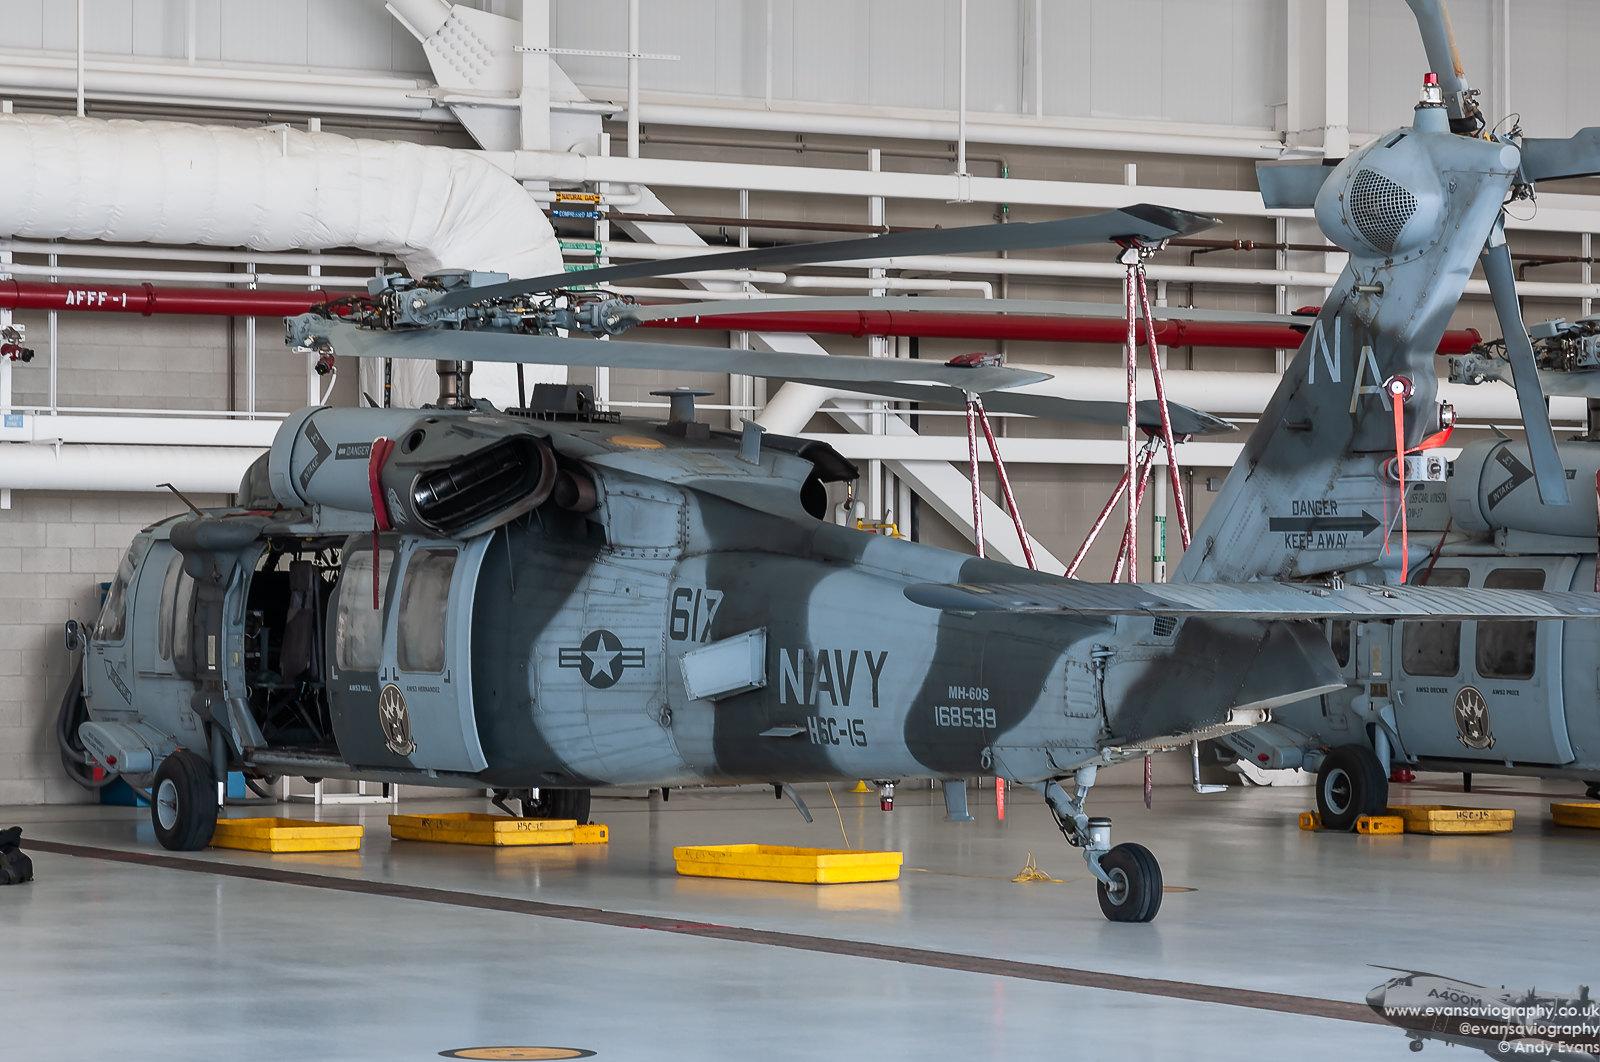 168539 MH-60S HSC-15